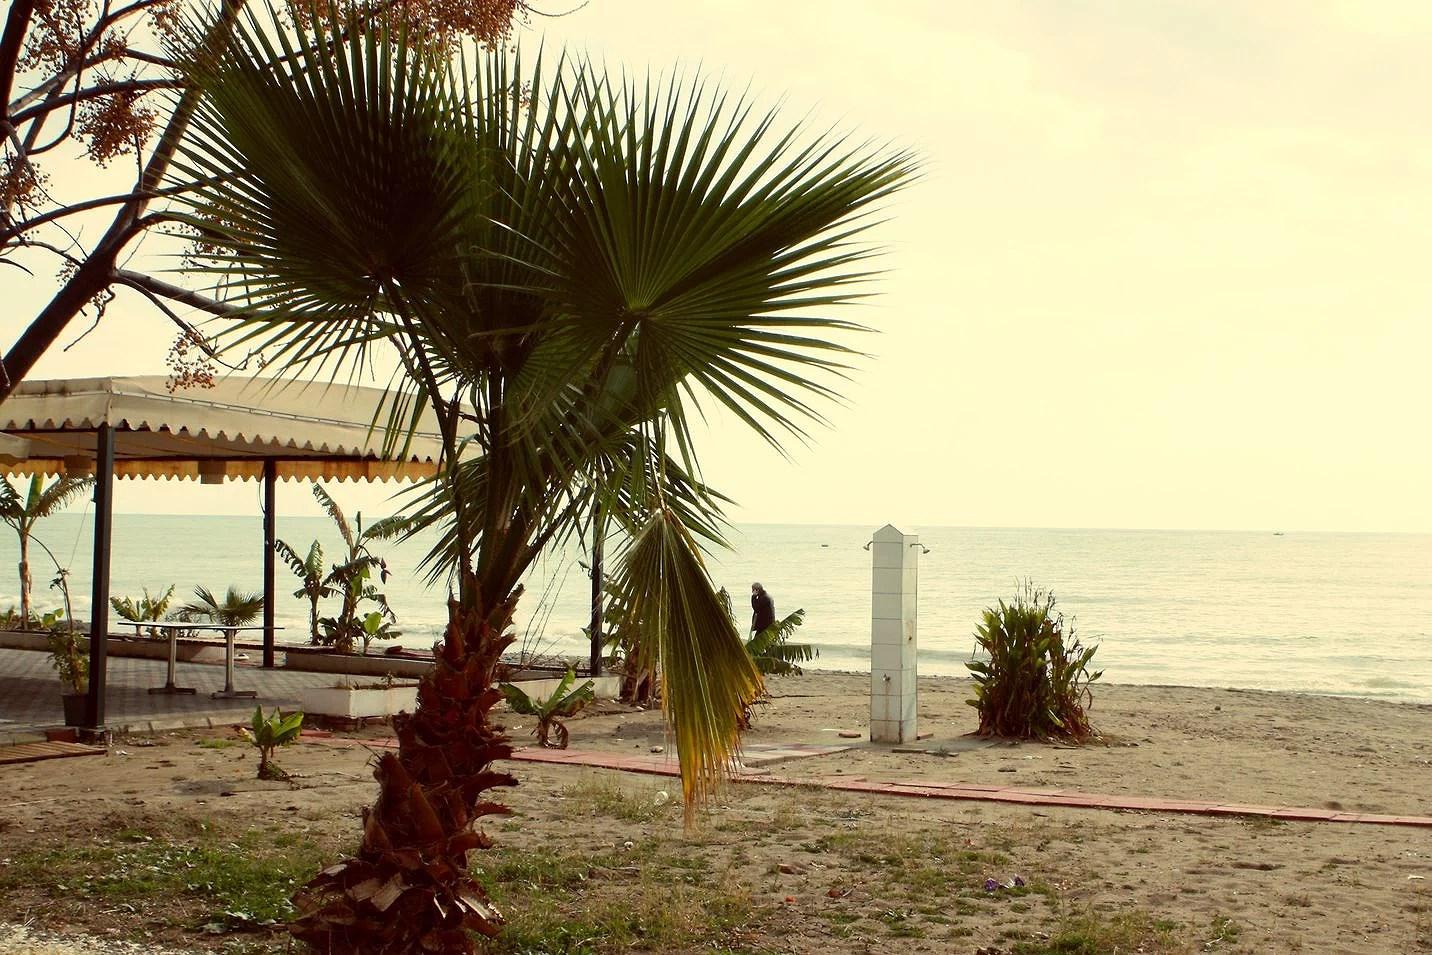 A stroll along the beachside